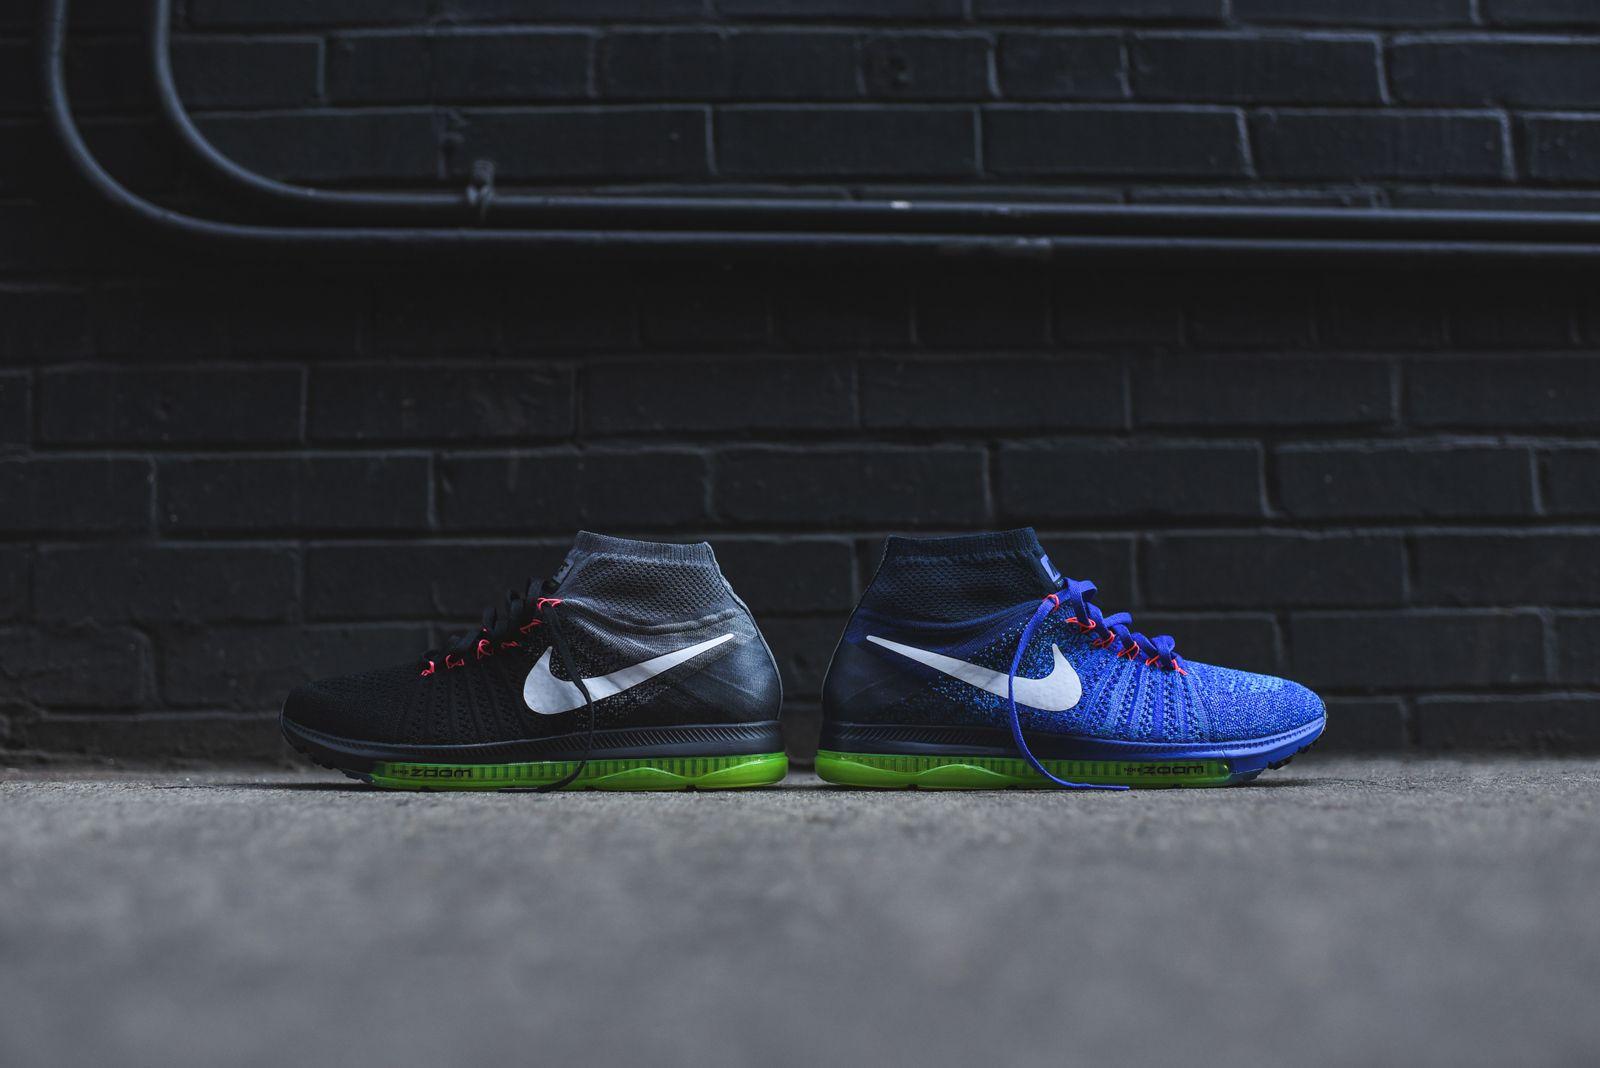 supra footwear paris - The Nike Kyrie 2 Duke PE Will Get A Retail Release | Duke, Nike ...